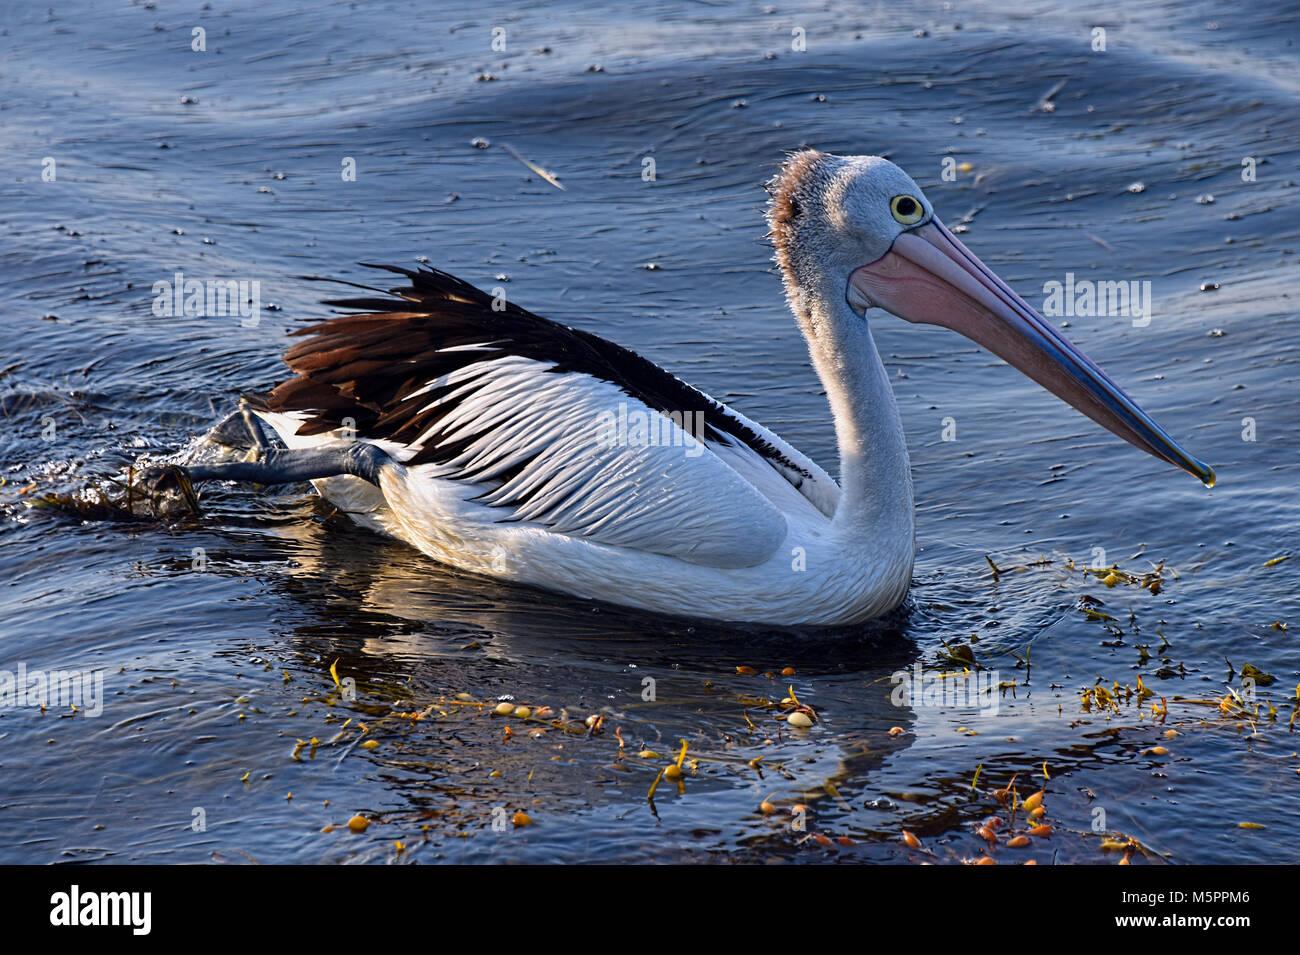 Pelican - Stock Image